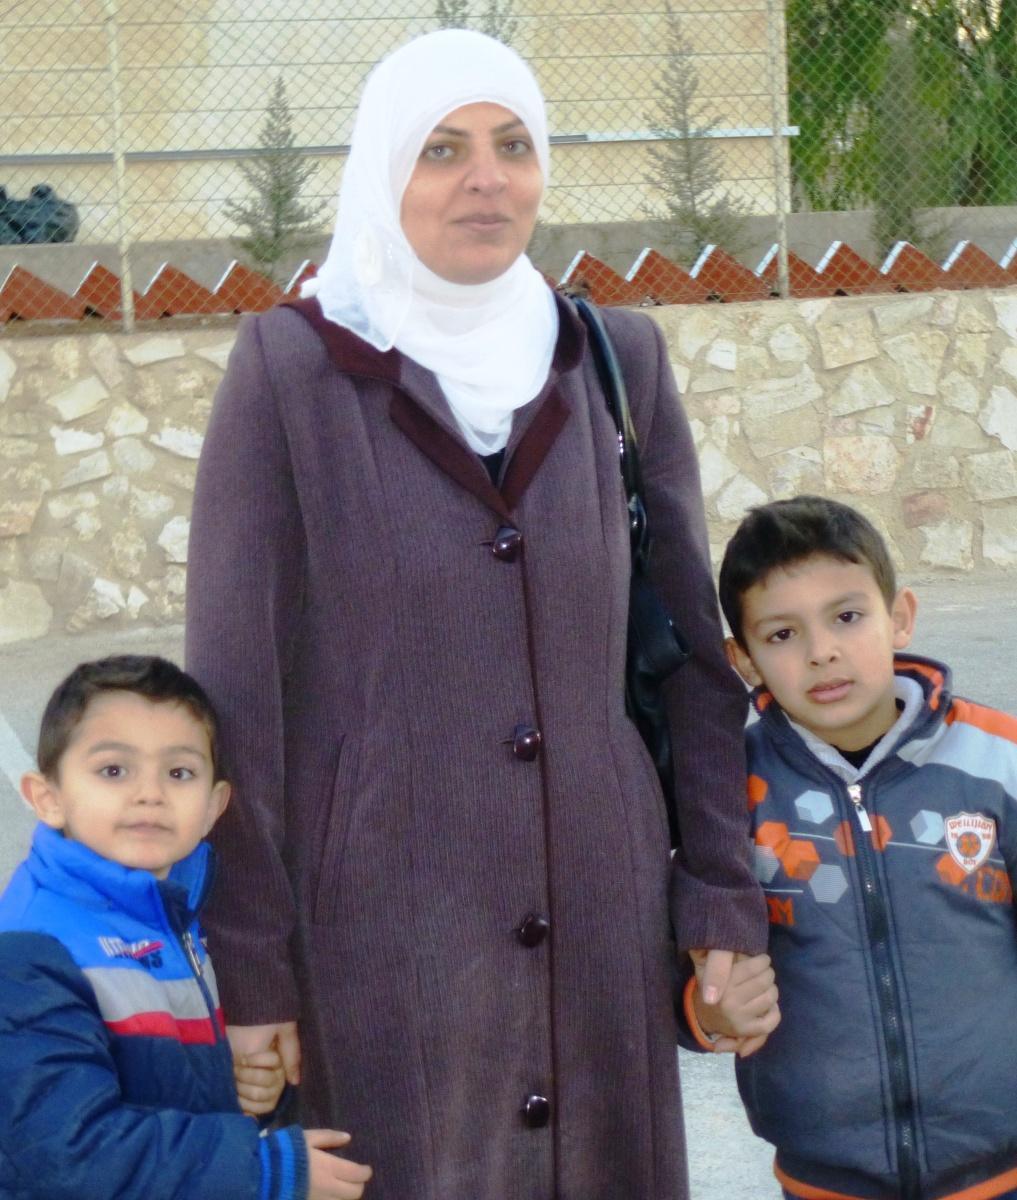 Refugiada siria en Jordania. África Martcitllach